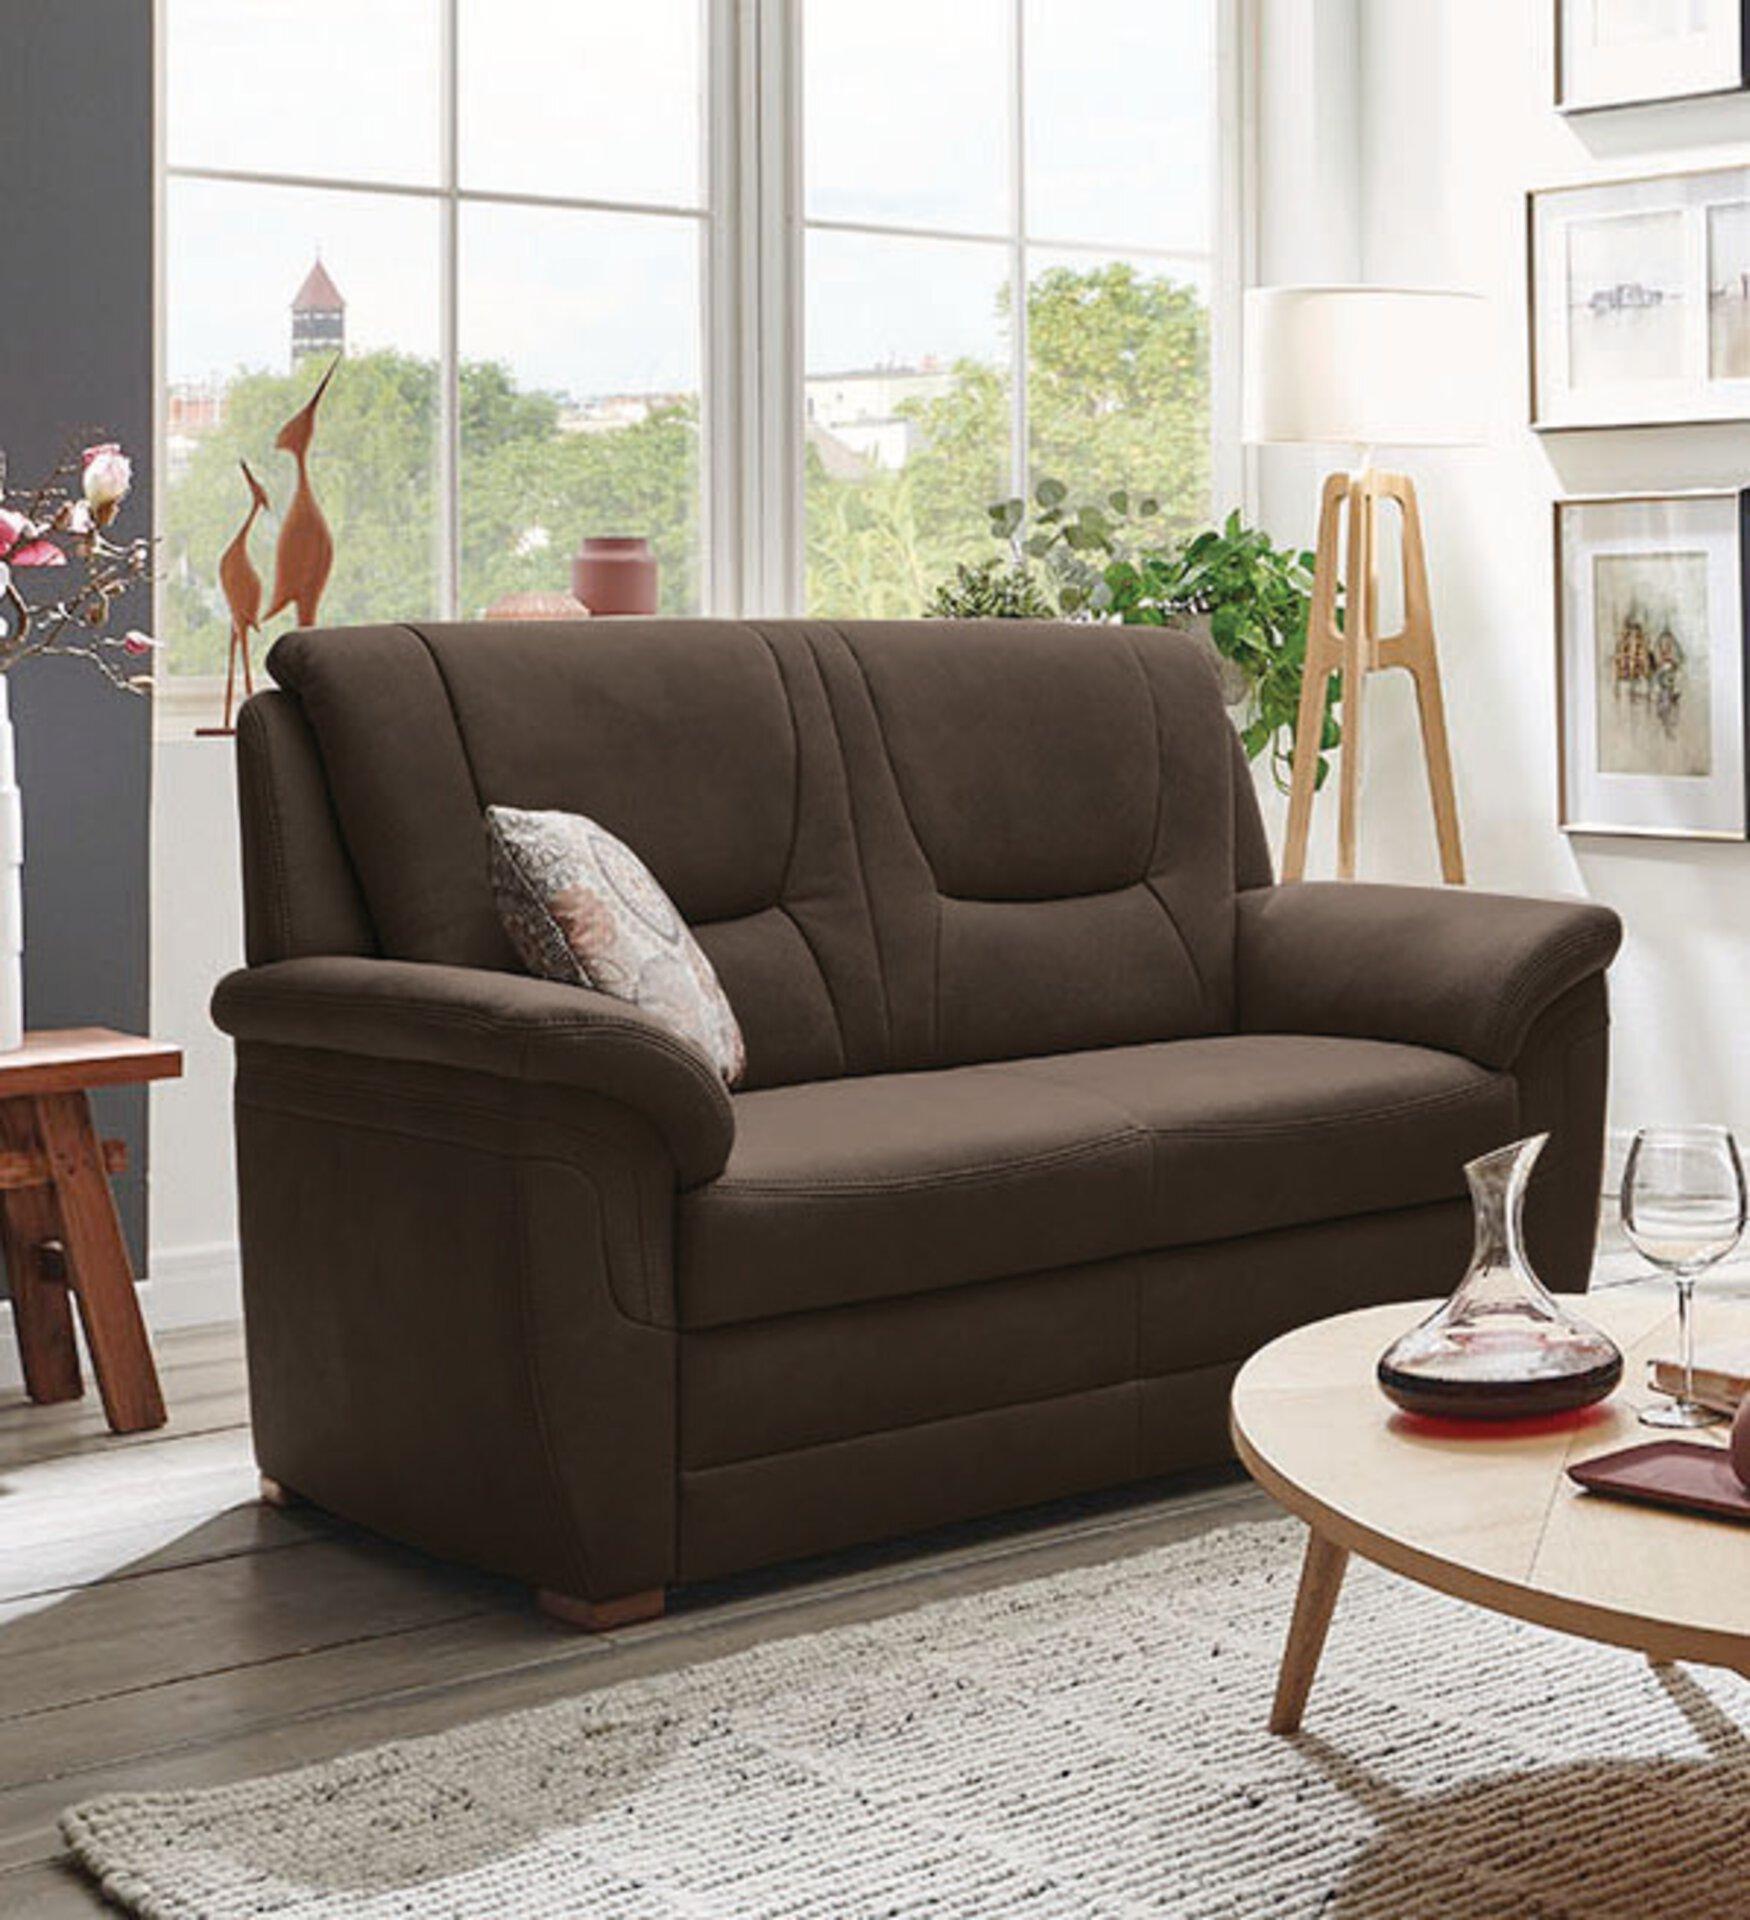 Sofa 3-Sitzer PP-QL11014 Systempolster Textil braun 92 x 103 x 198 cm